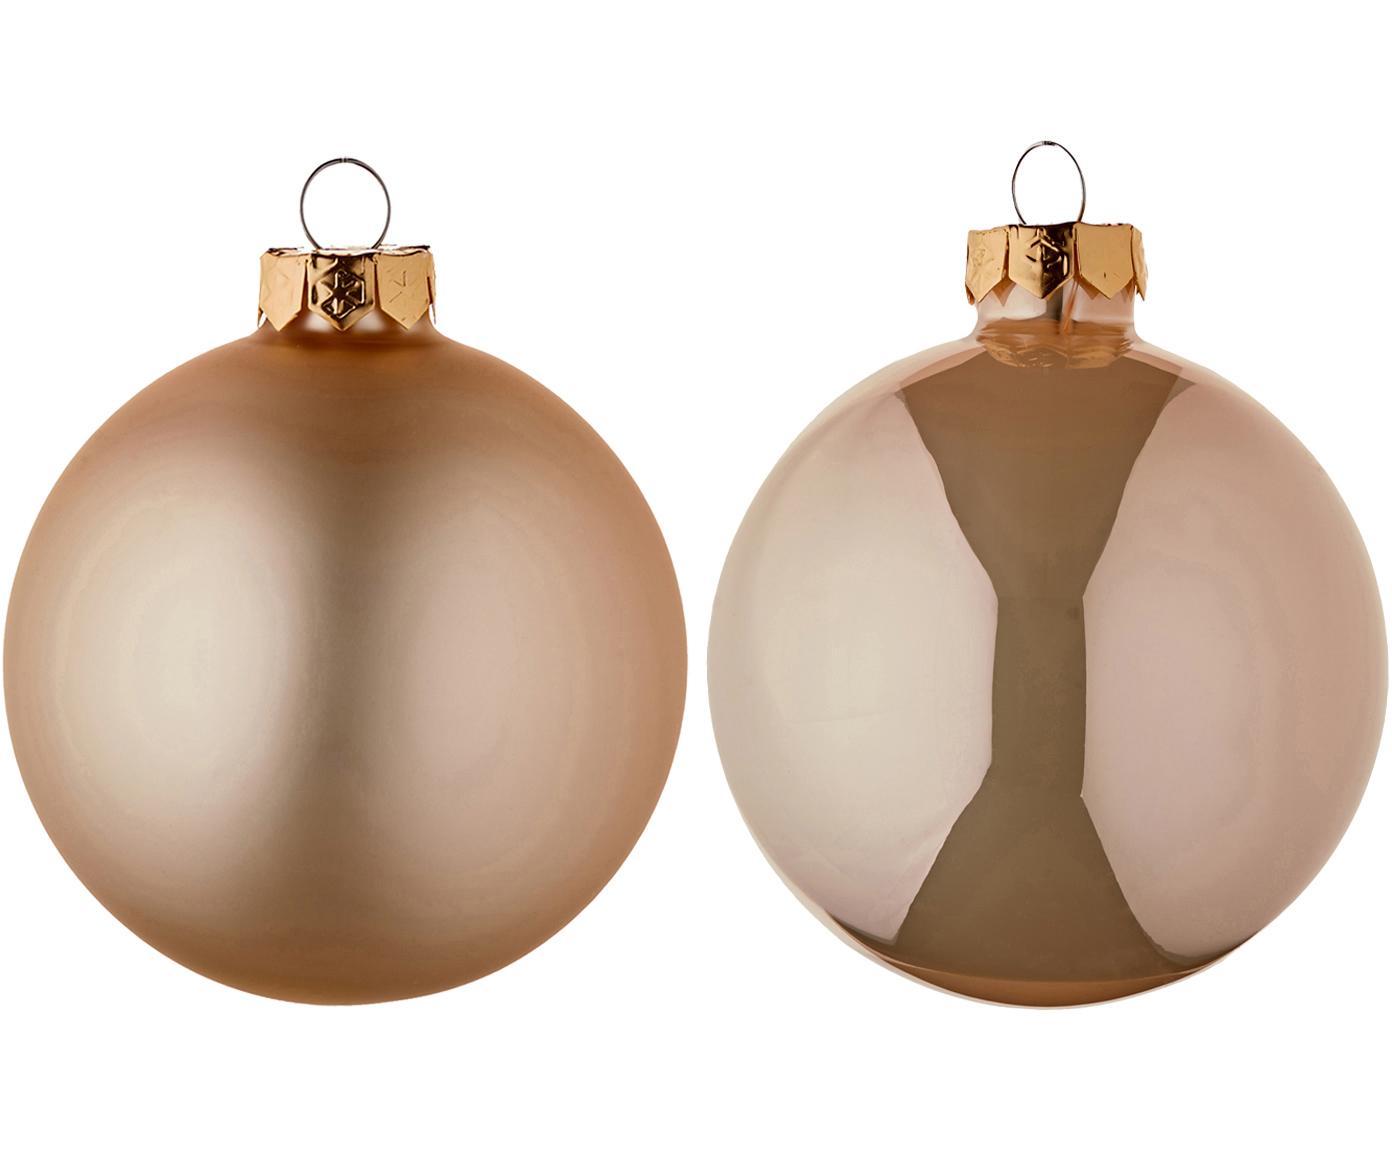 Weihnachtskugel-Set EvergreenØ8cm, 6-tlg., Cremefarben, Ø 8 cm